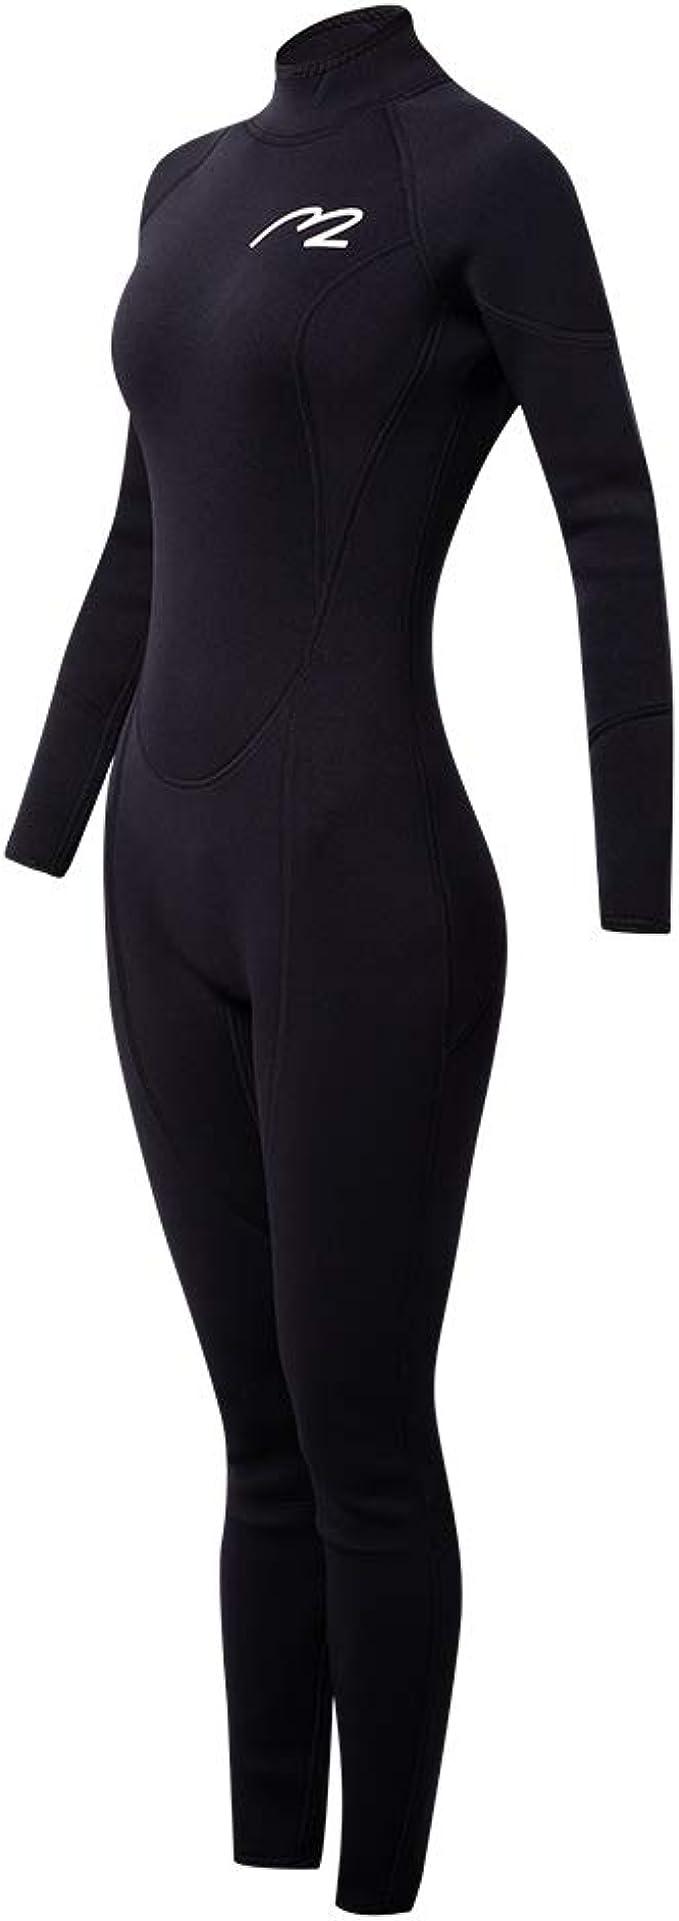 hudiemm0B Wetsuit,Men Women Full Body Diving Suit Stretch Anti-UV Swimming Surf Clothes